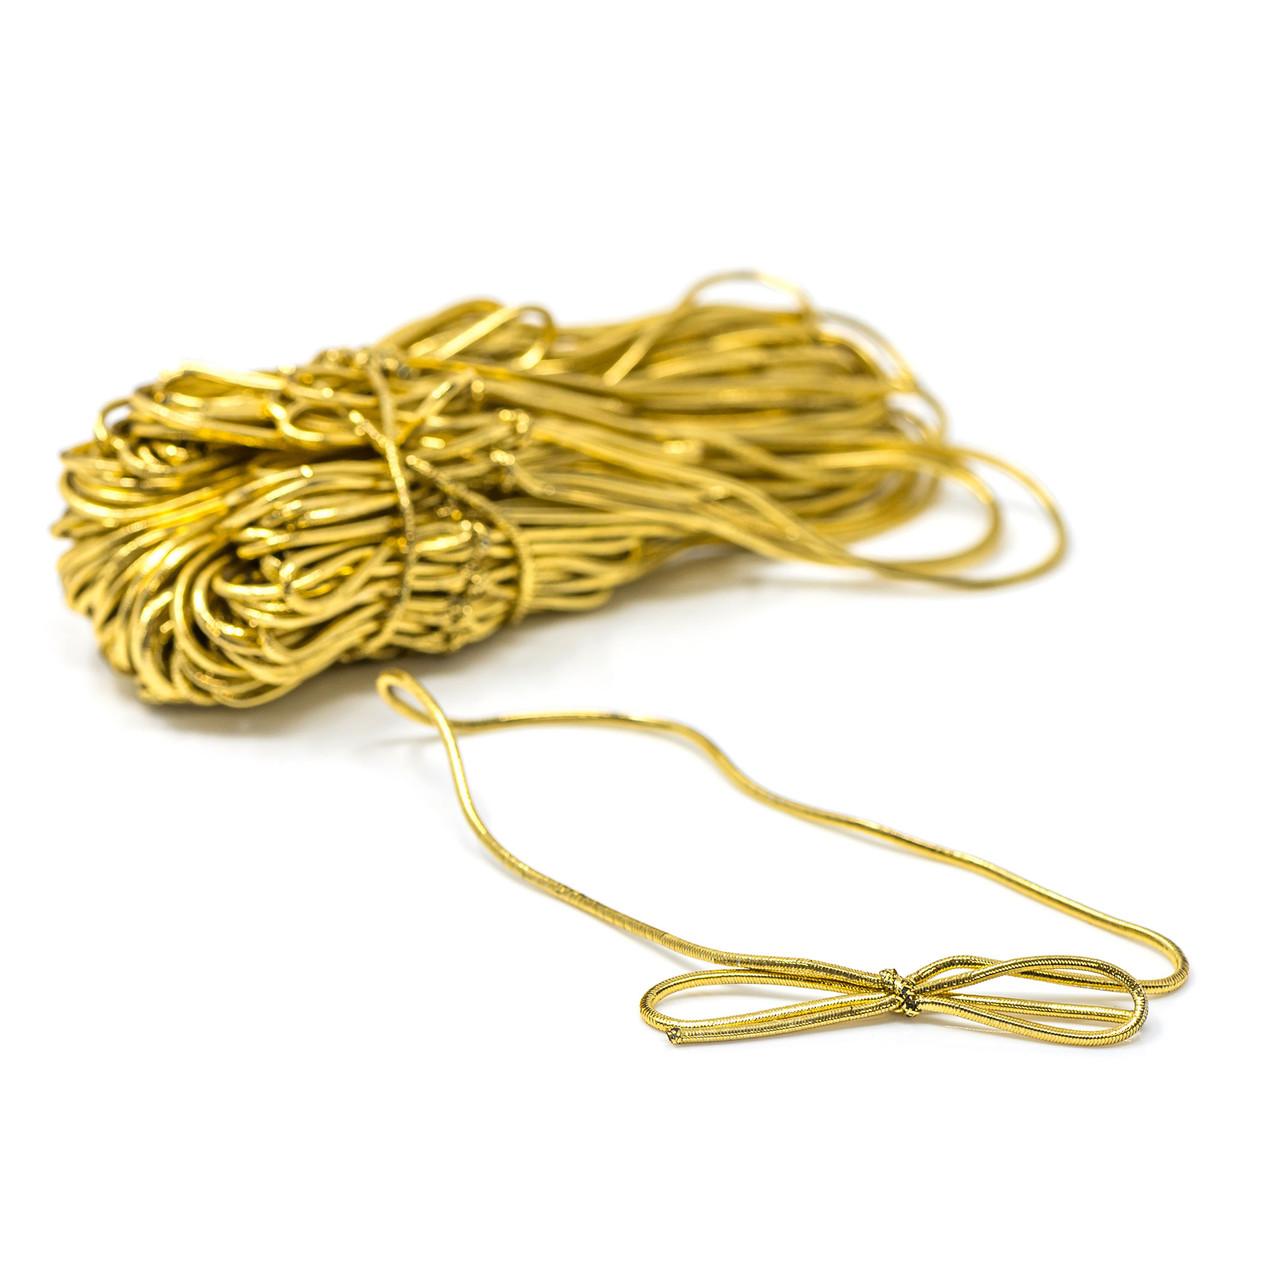 Gold Cord - Long